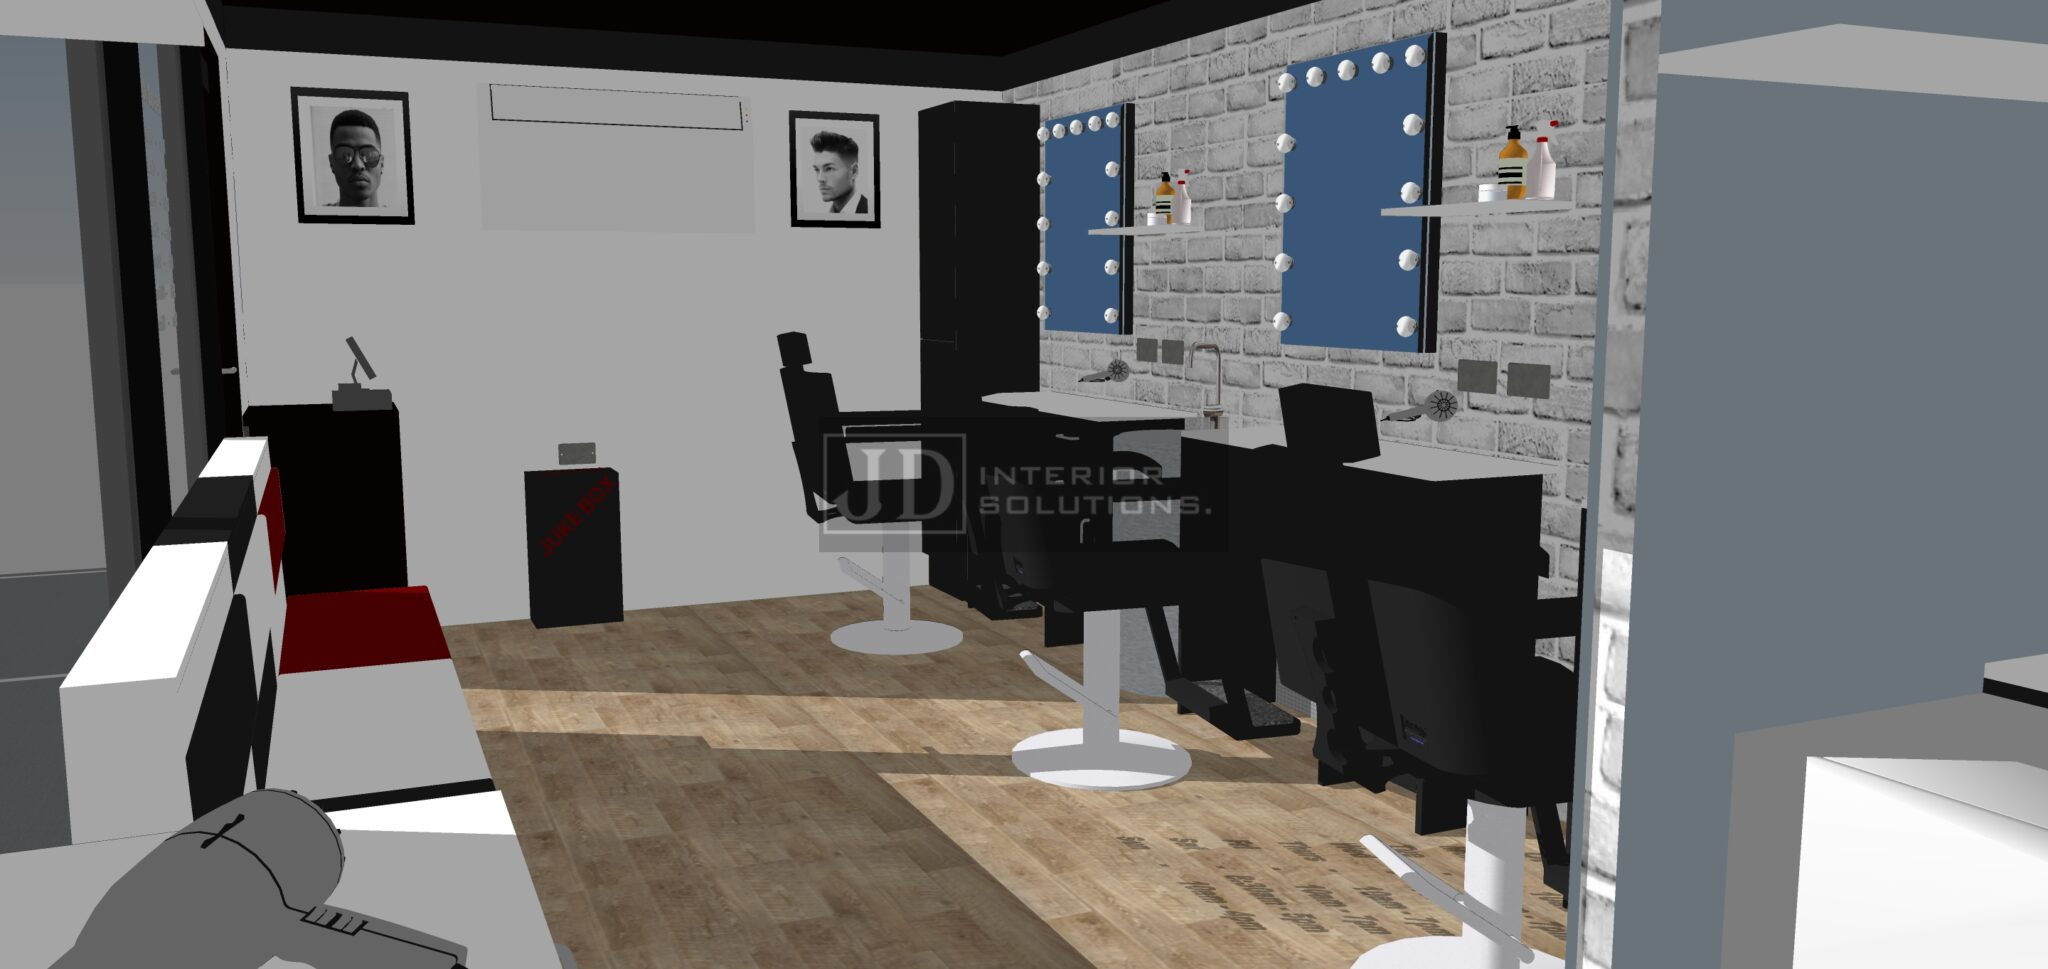 LA Jaks Barbershop - 6.8m x 3.4m3